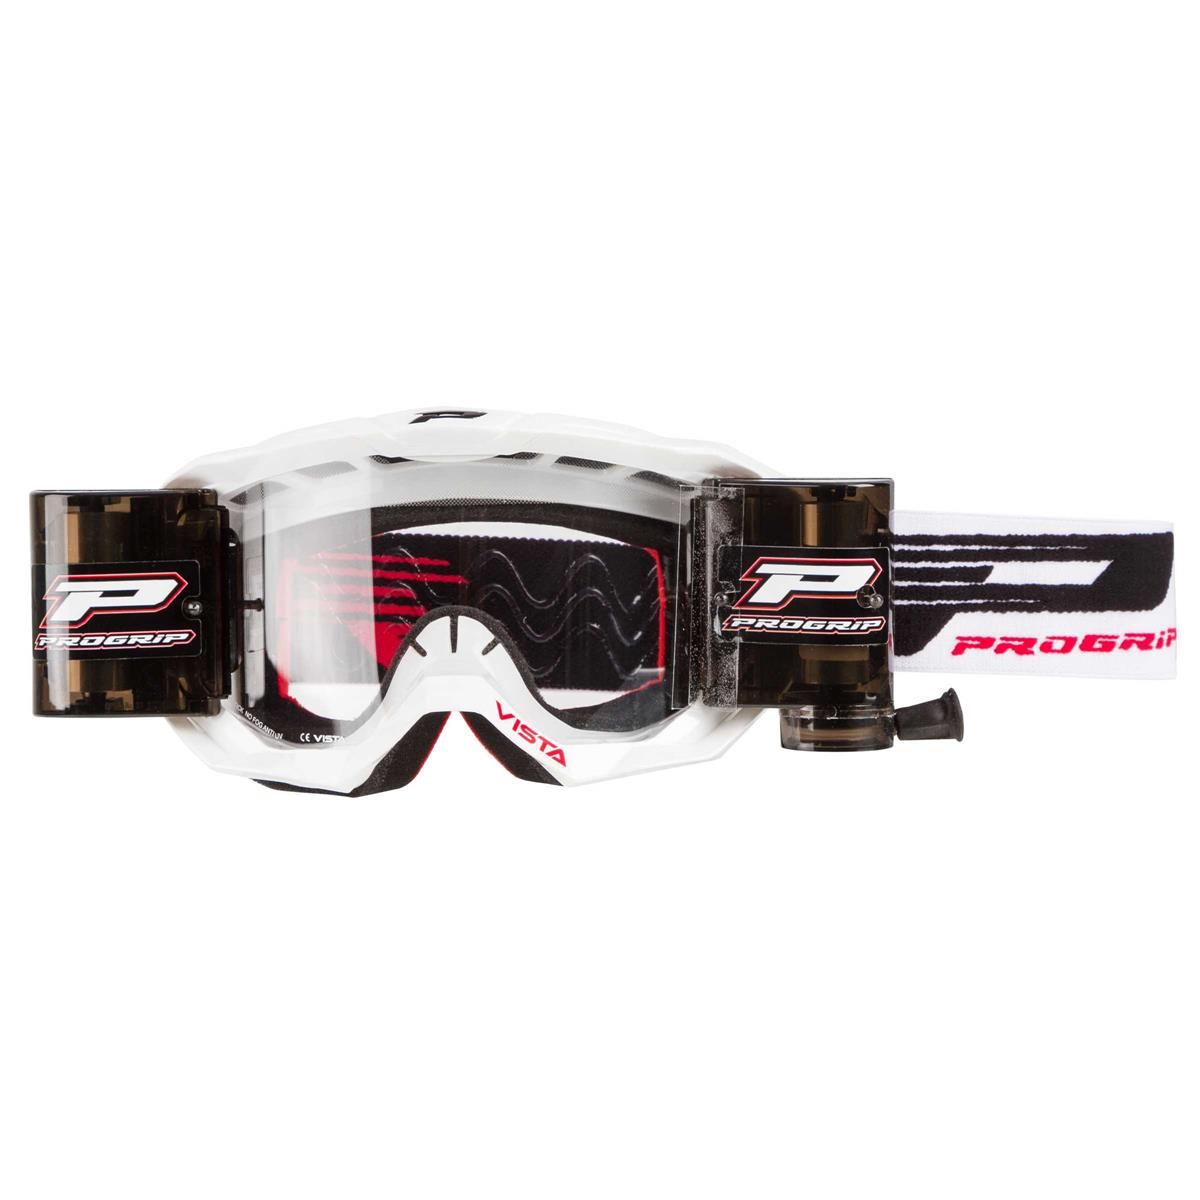 ProGrip Crossbrille 3303 RO Weiß